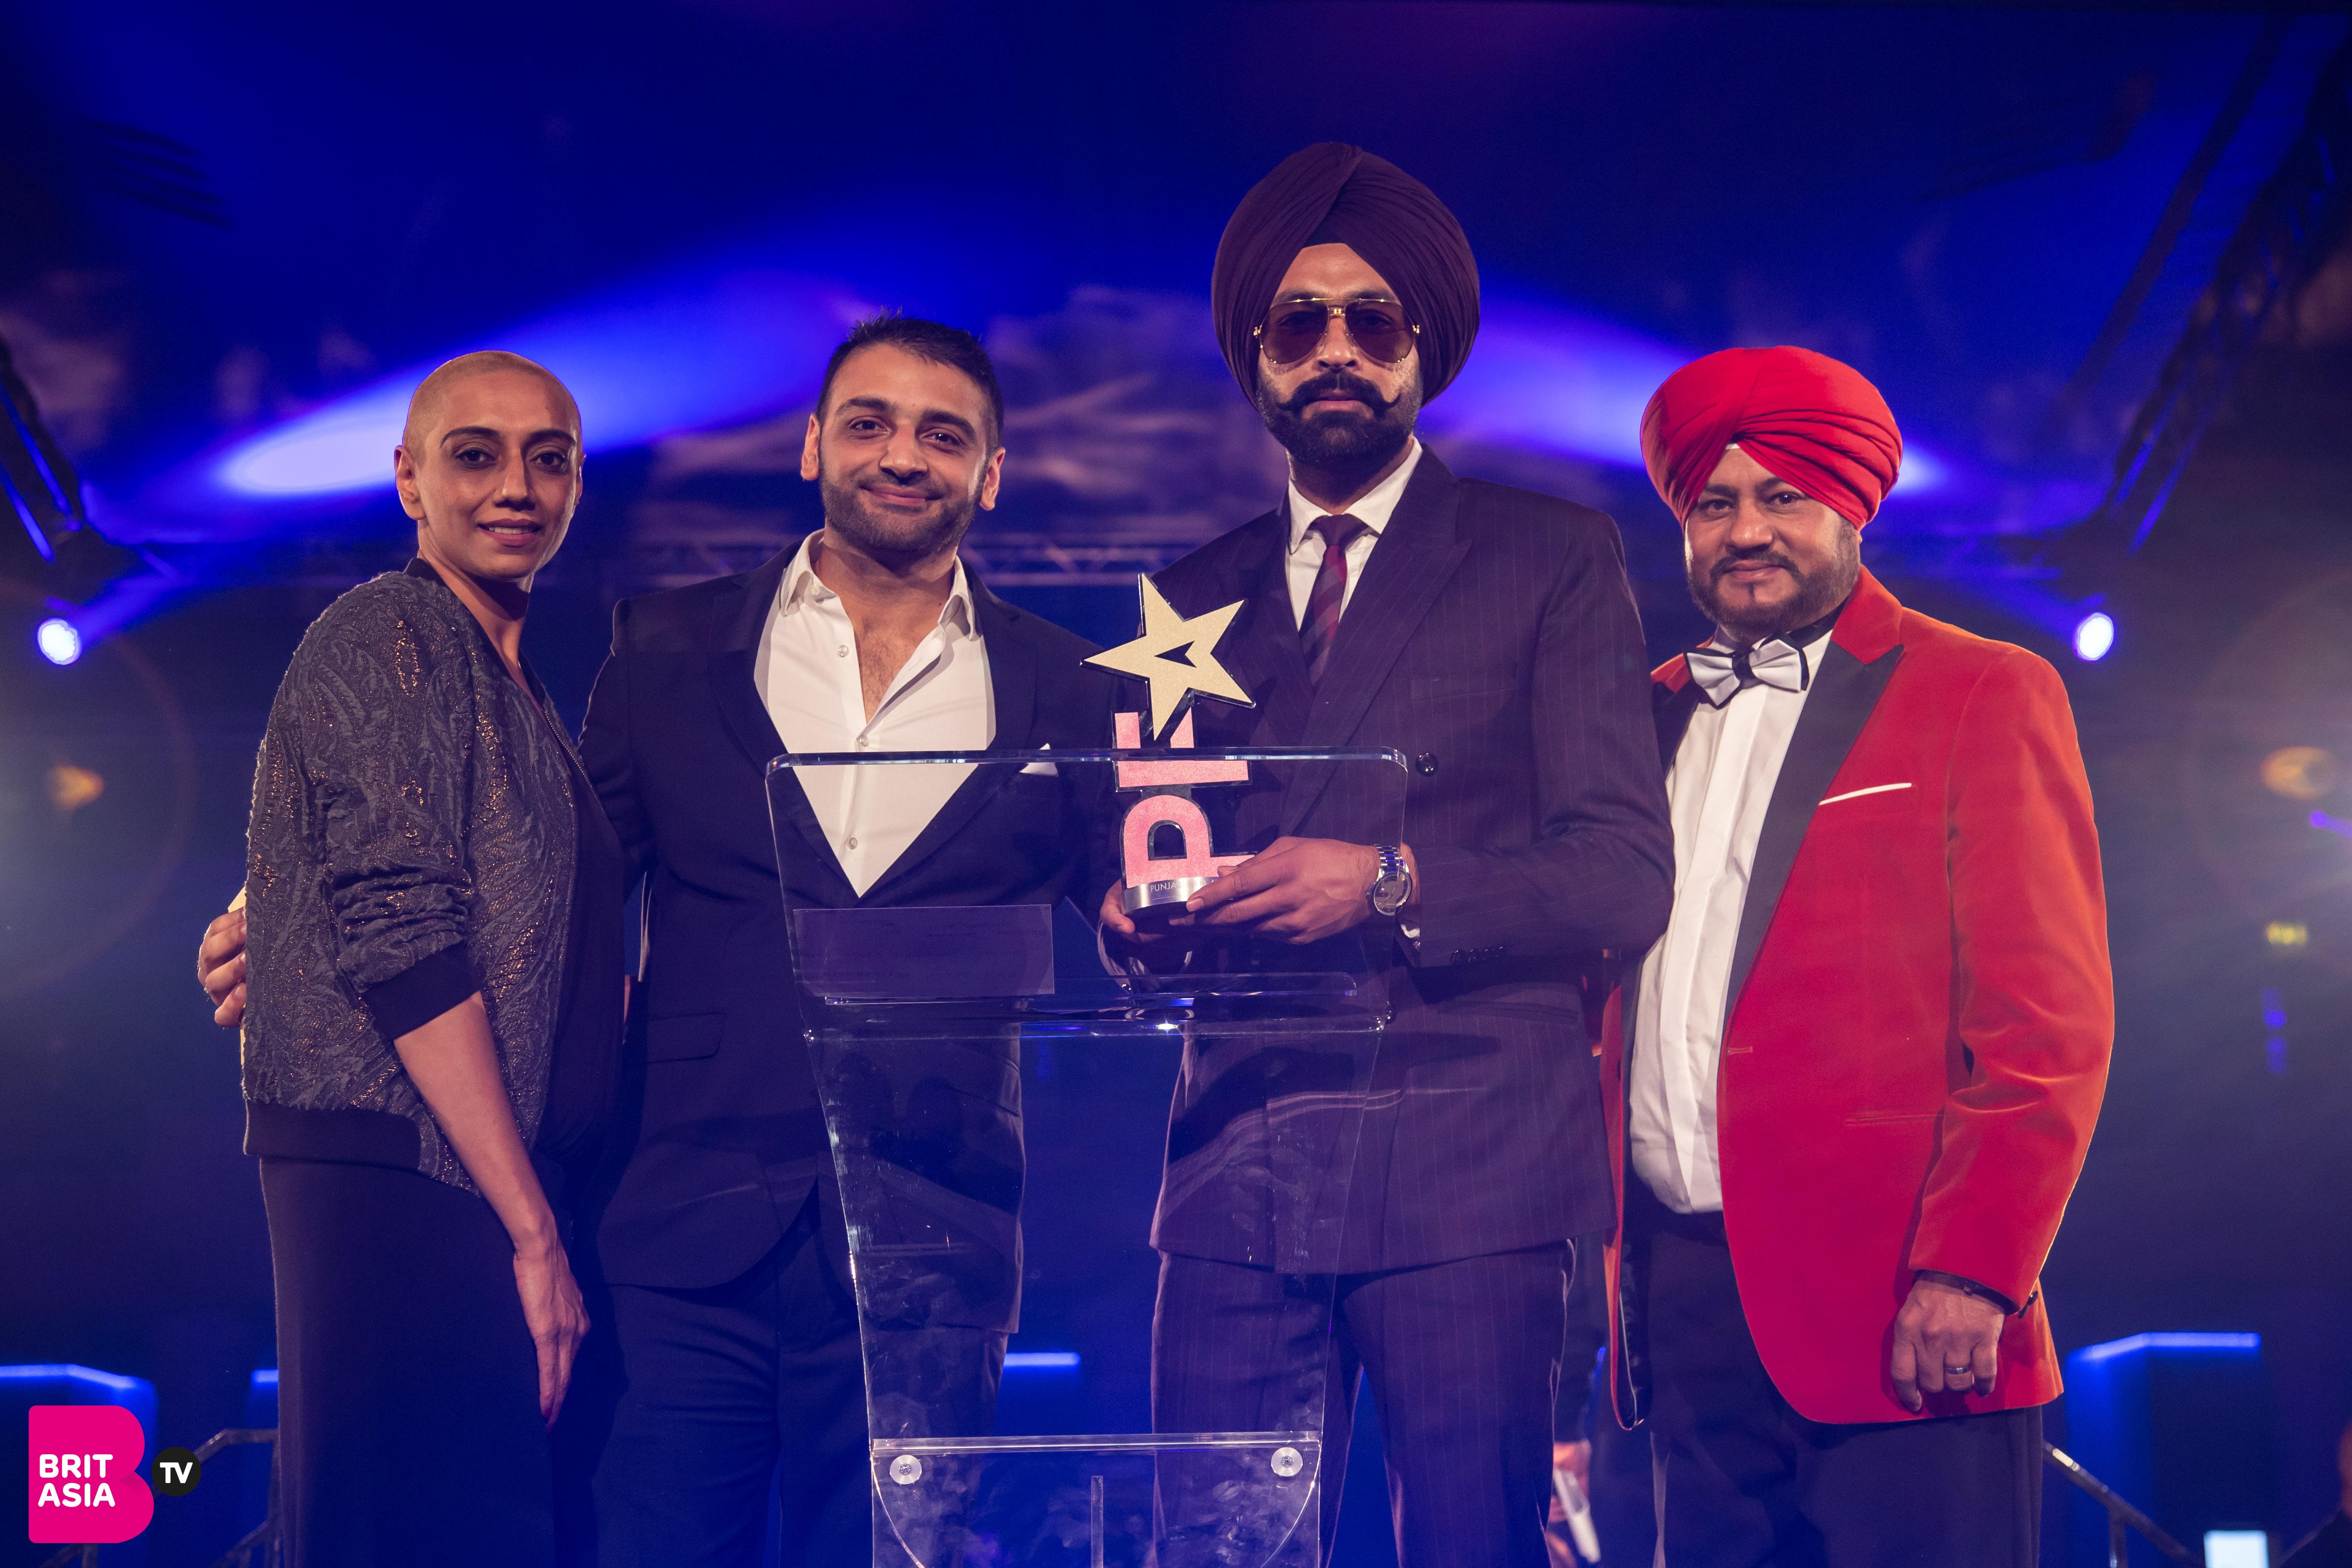 Balwinder Safri and sponsor Decadence/Manac Vodka present the award for Best Debut Performance